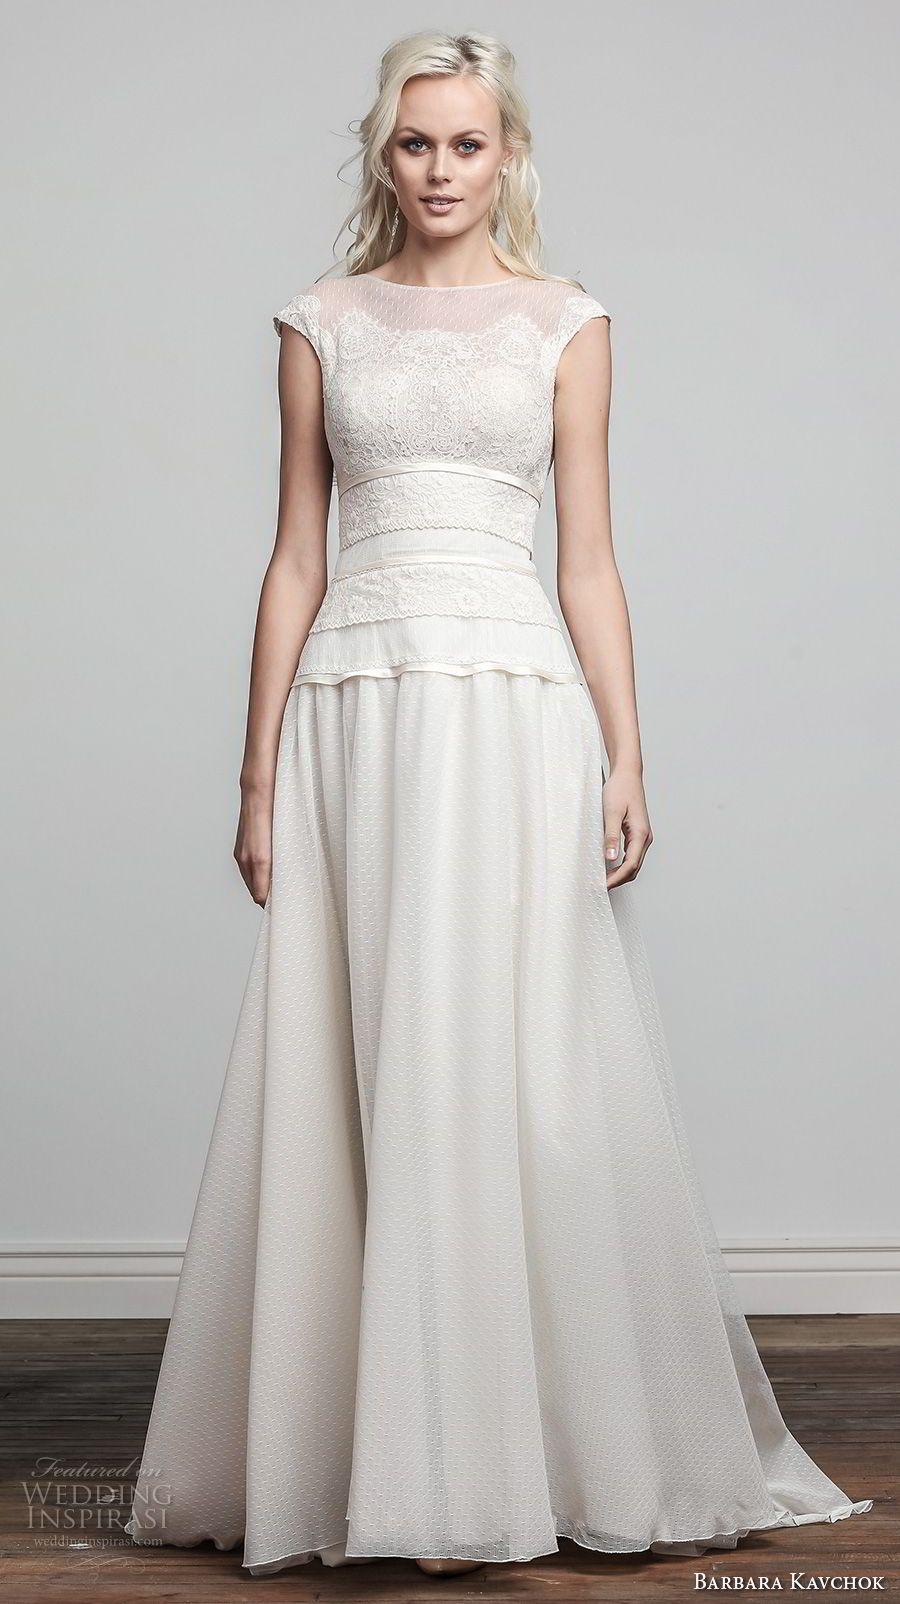 Barbara kavchok spring wedding dresses romantic wedding